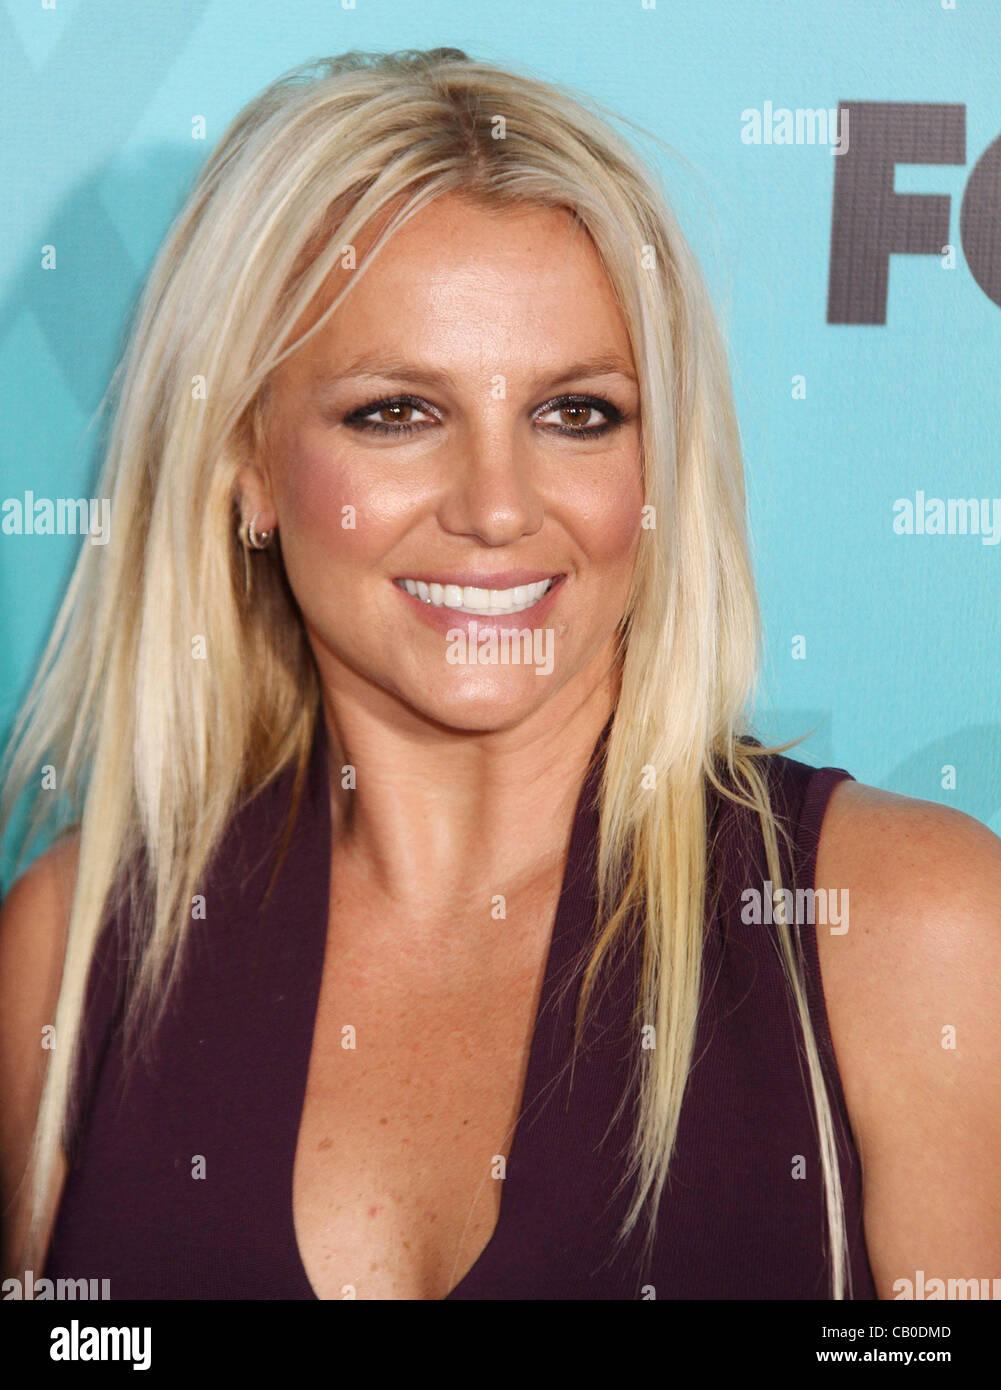 May 14, 2012 - New York, New York, U.S. - Singer/judge BRITNEY SPEARS Stock  Photo - Alamy